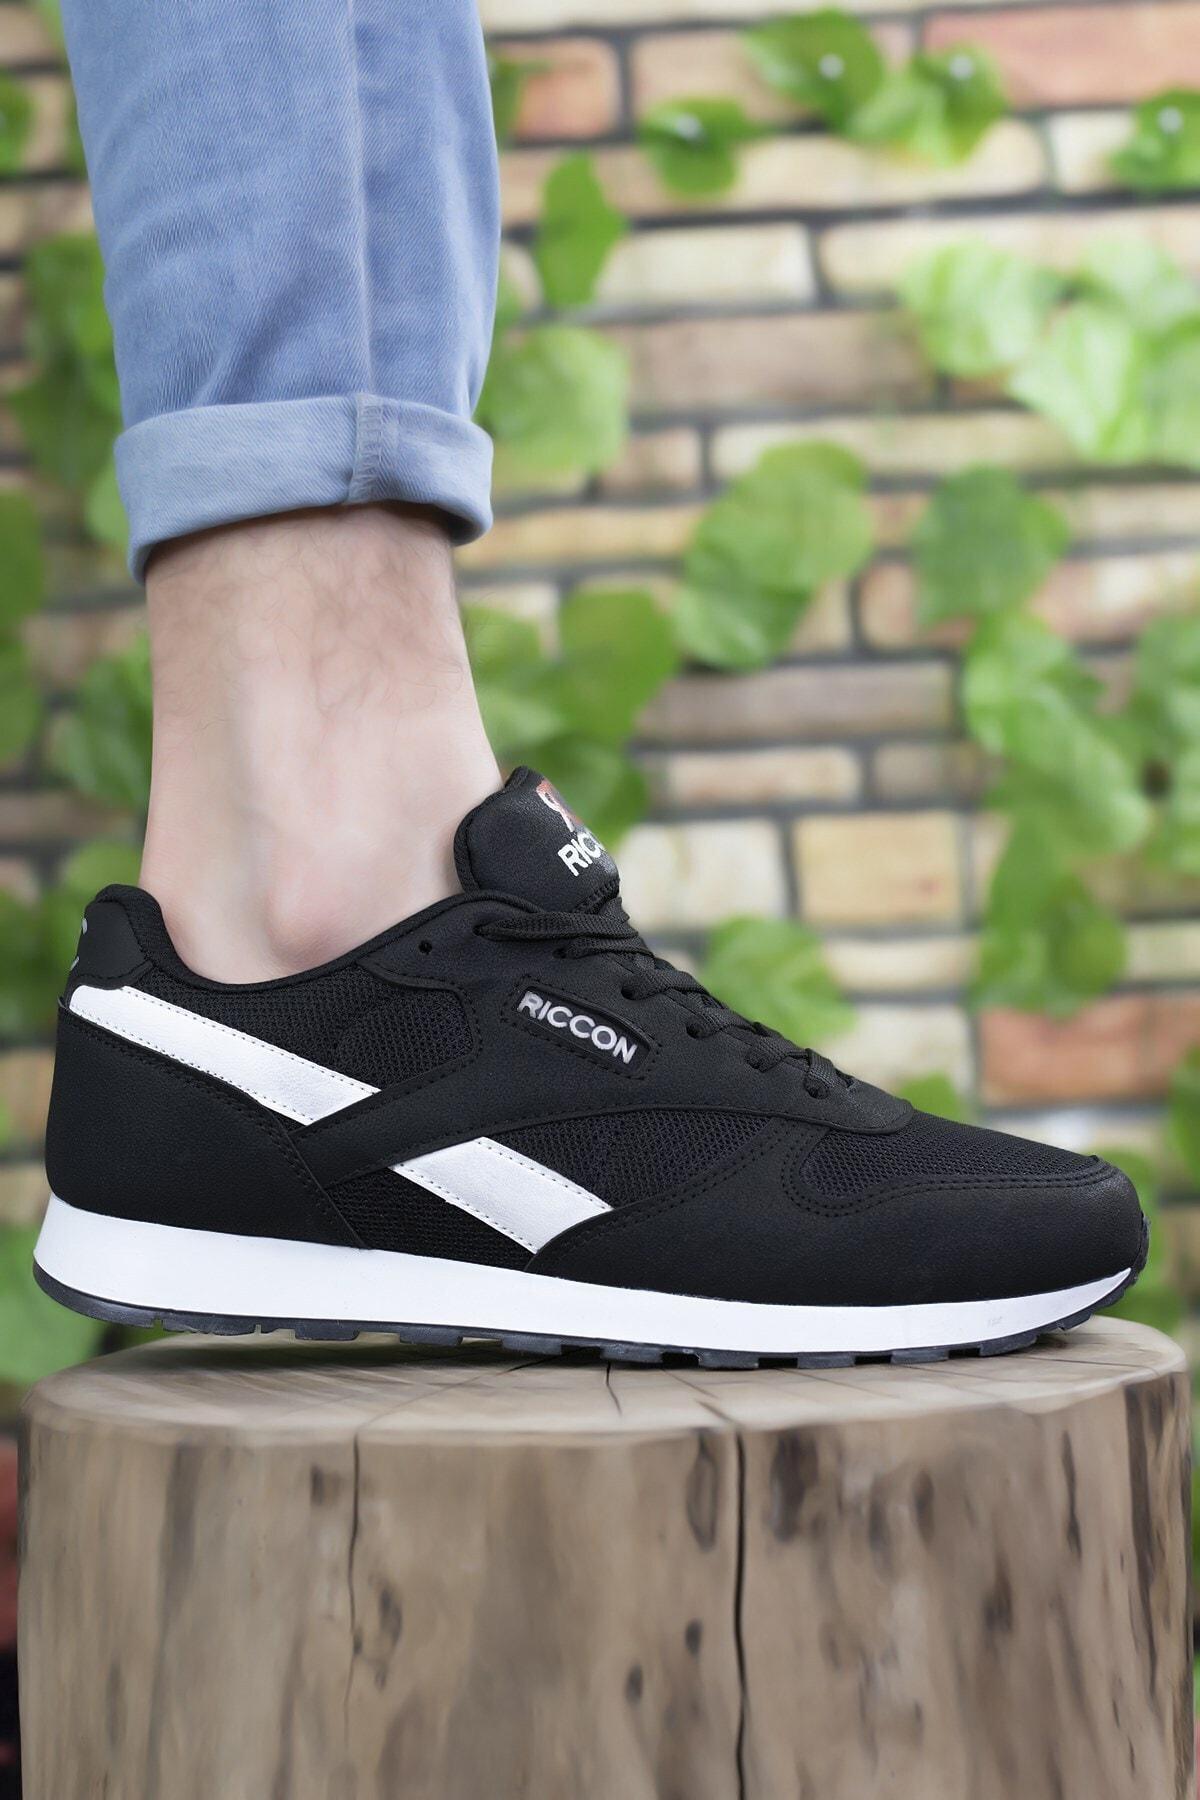 Riccon Siyah Beyaz Unisex Sneaker 0012853 2